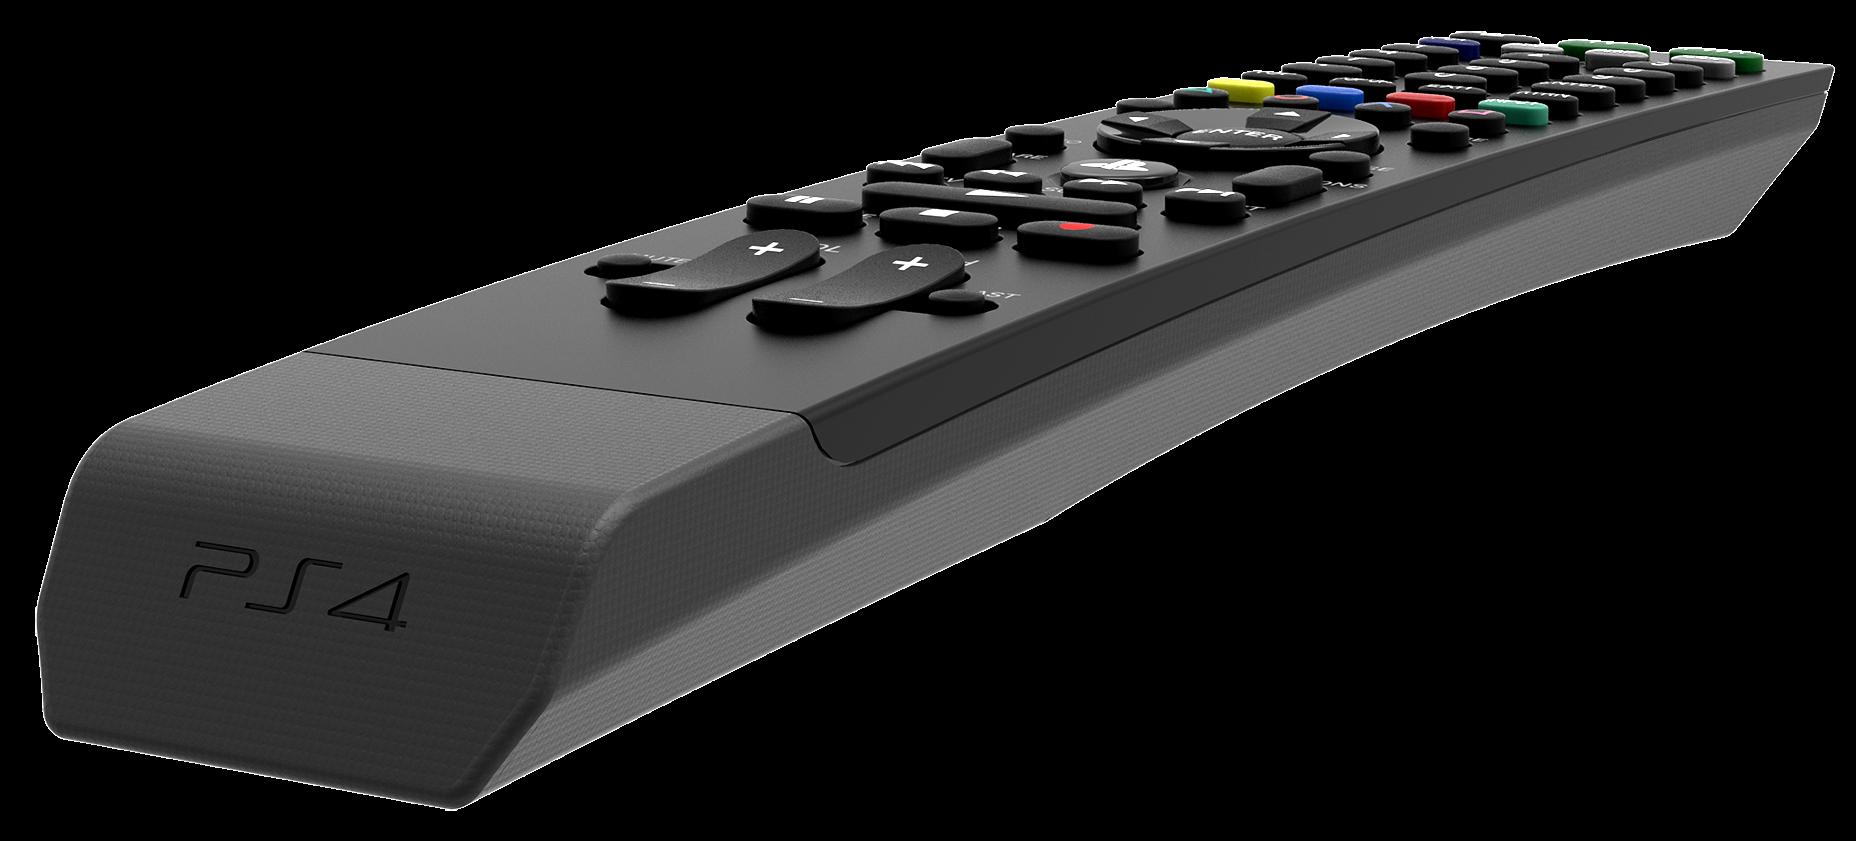 PS4 control remoto (4)